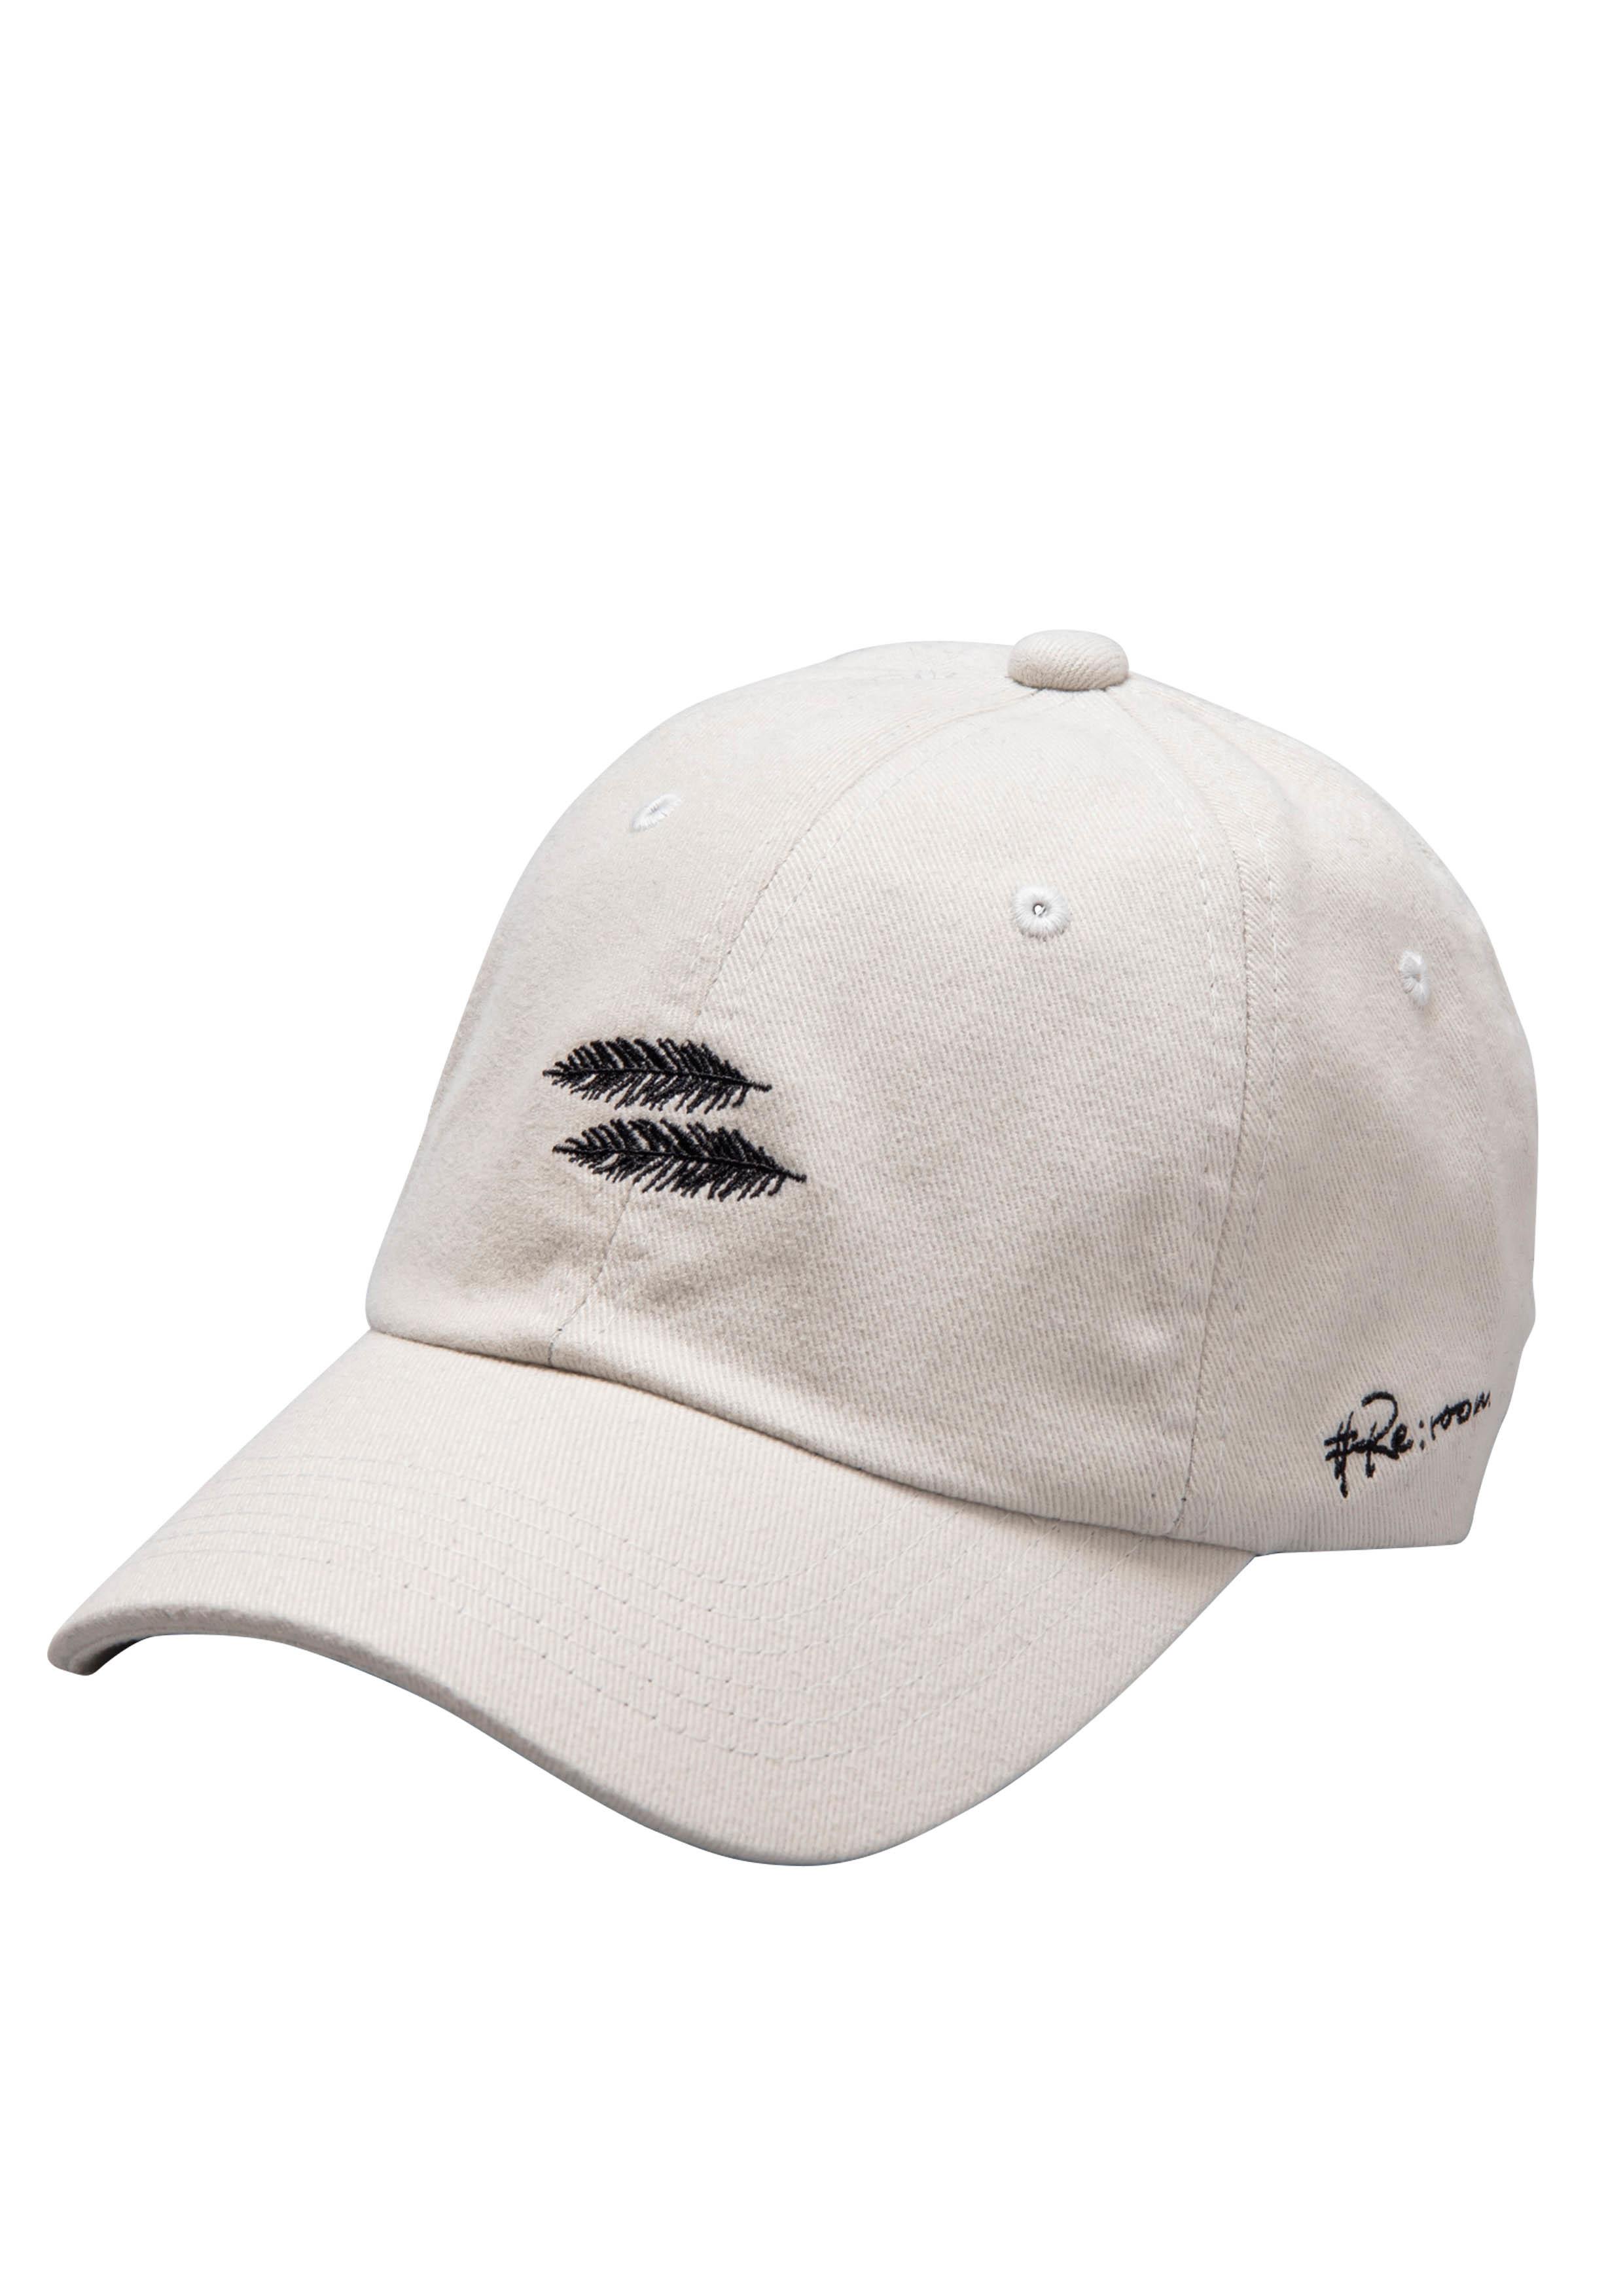 PALM REAF LOGO COTTON CAP[REH067]